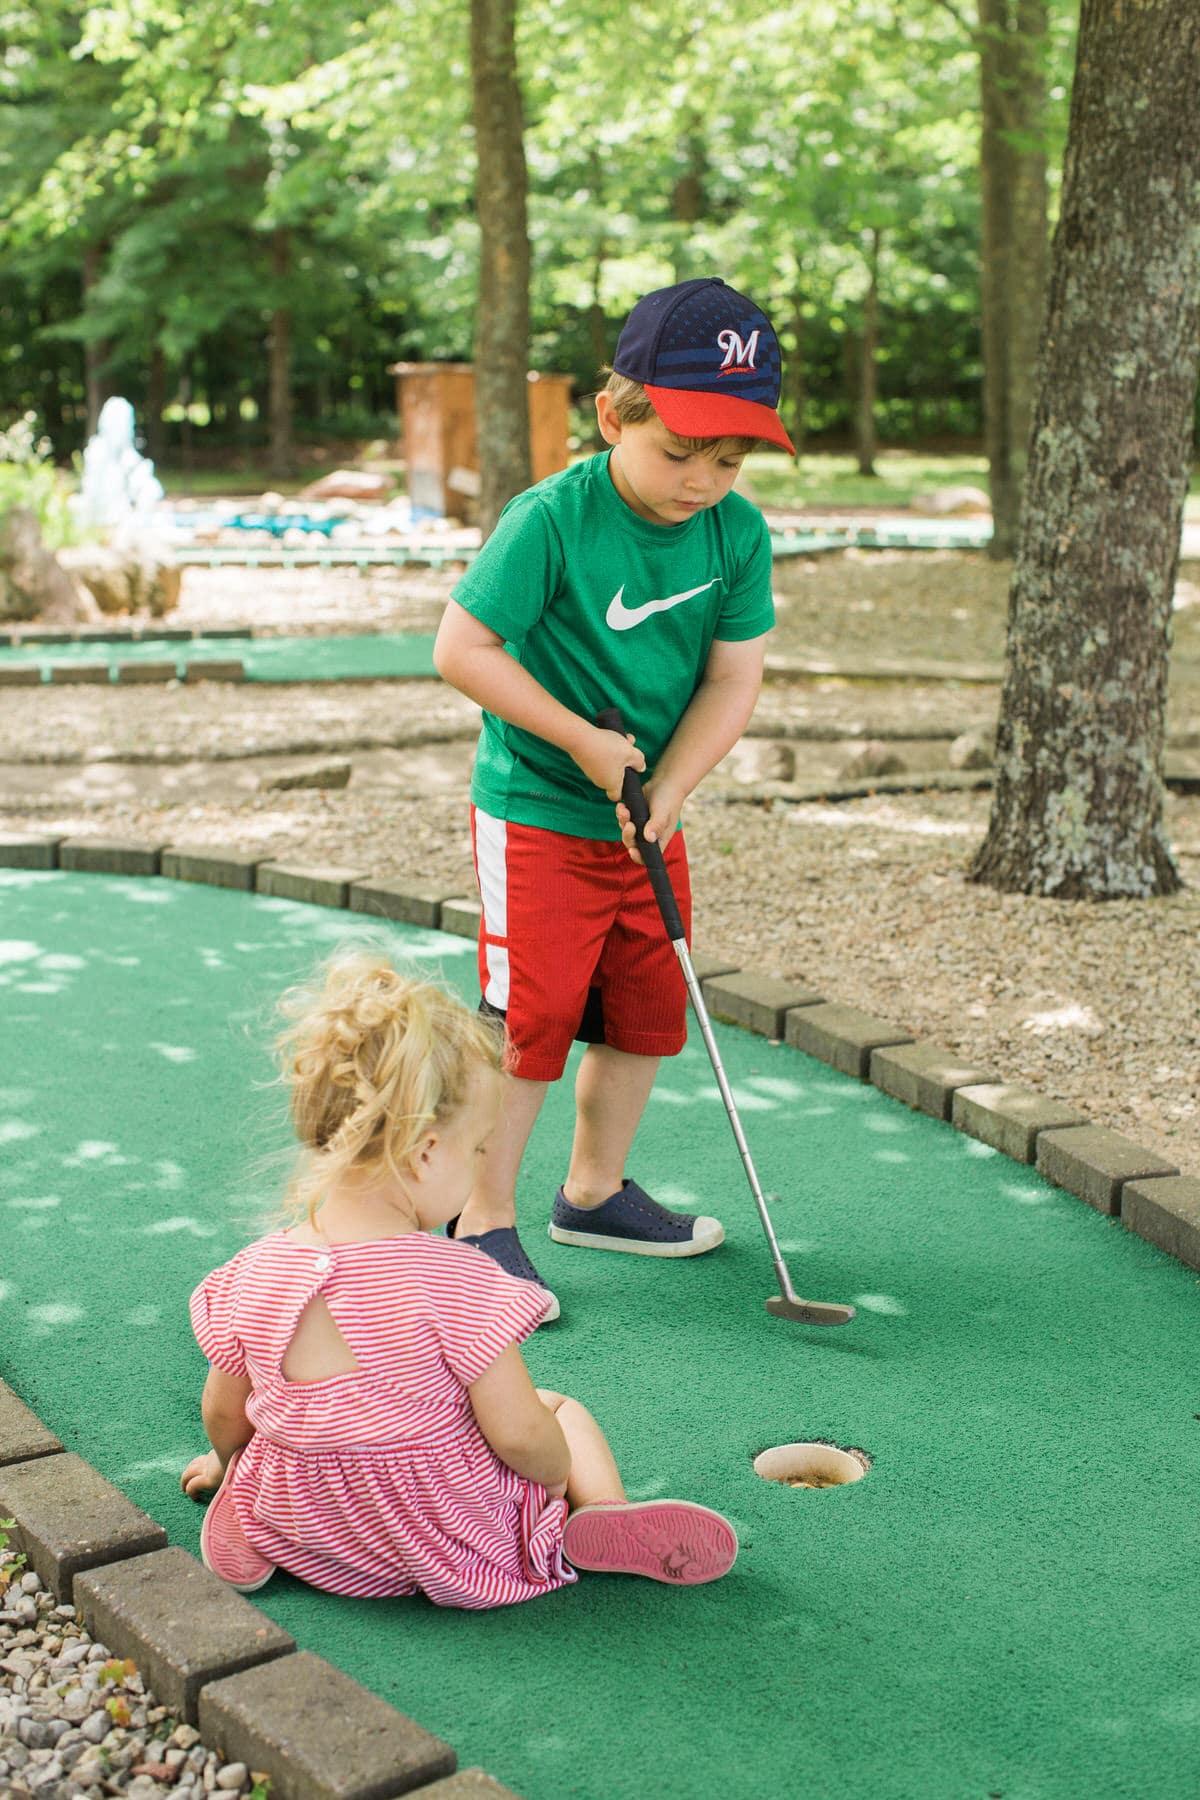 mini-golf-Crivitz-Wisconsin-fine-art-photography-by-Studio-L-photographer-Laura-Schneider-_9658